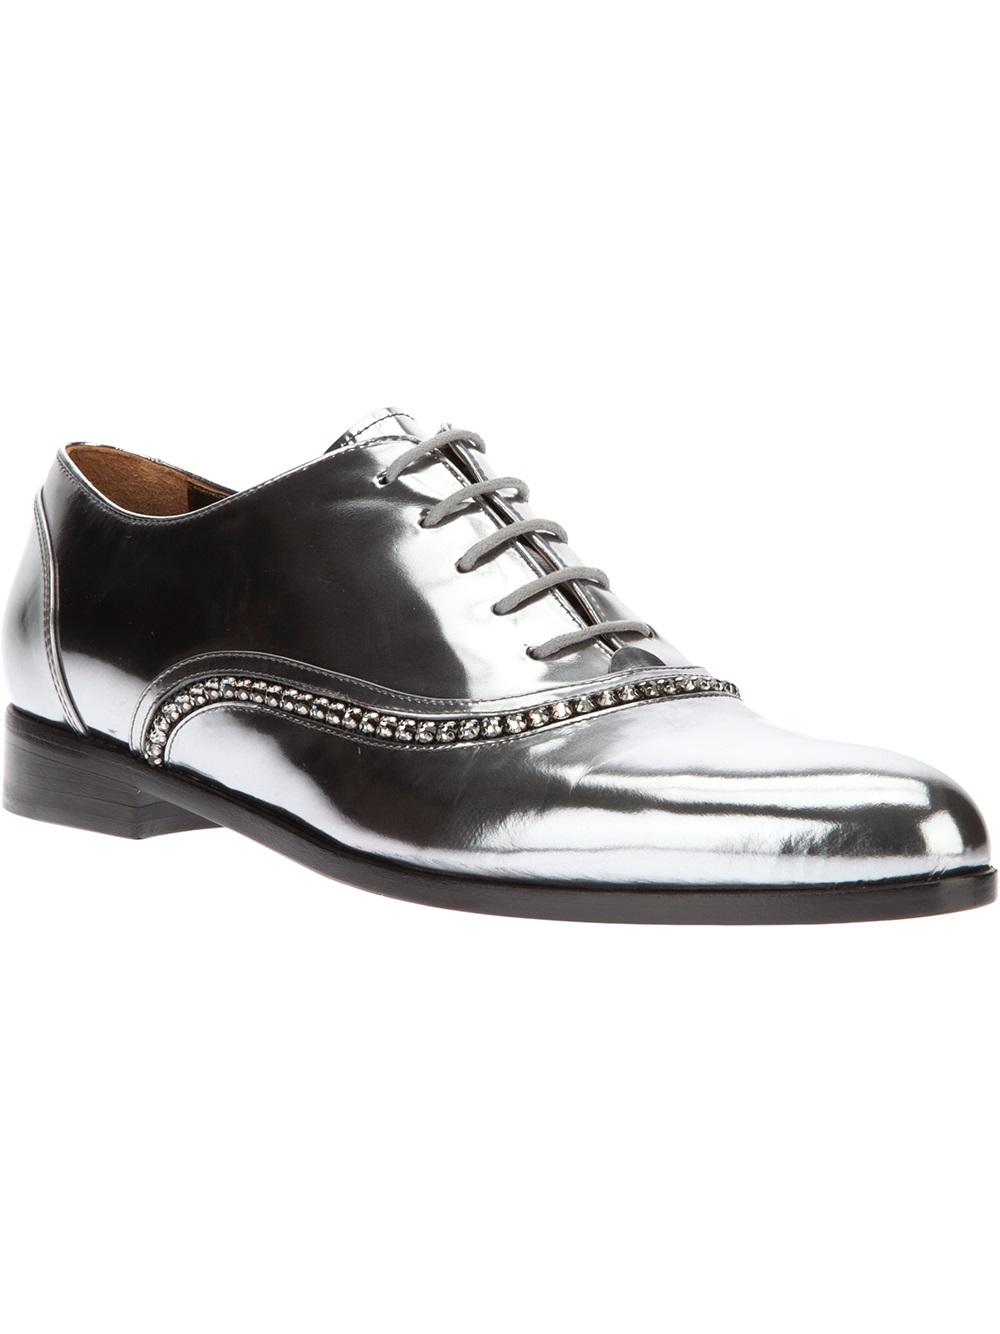 Lanvin Crystal Embellished Oxford Shoe In Silver (metallic) | Lyst